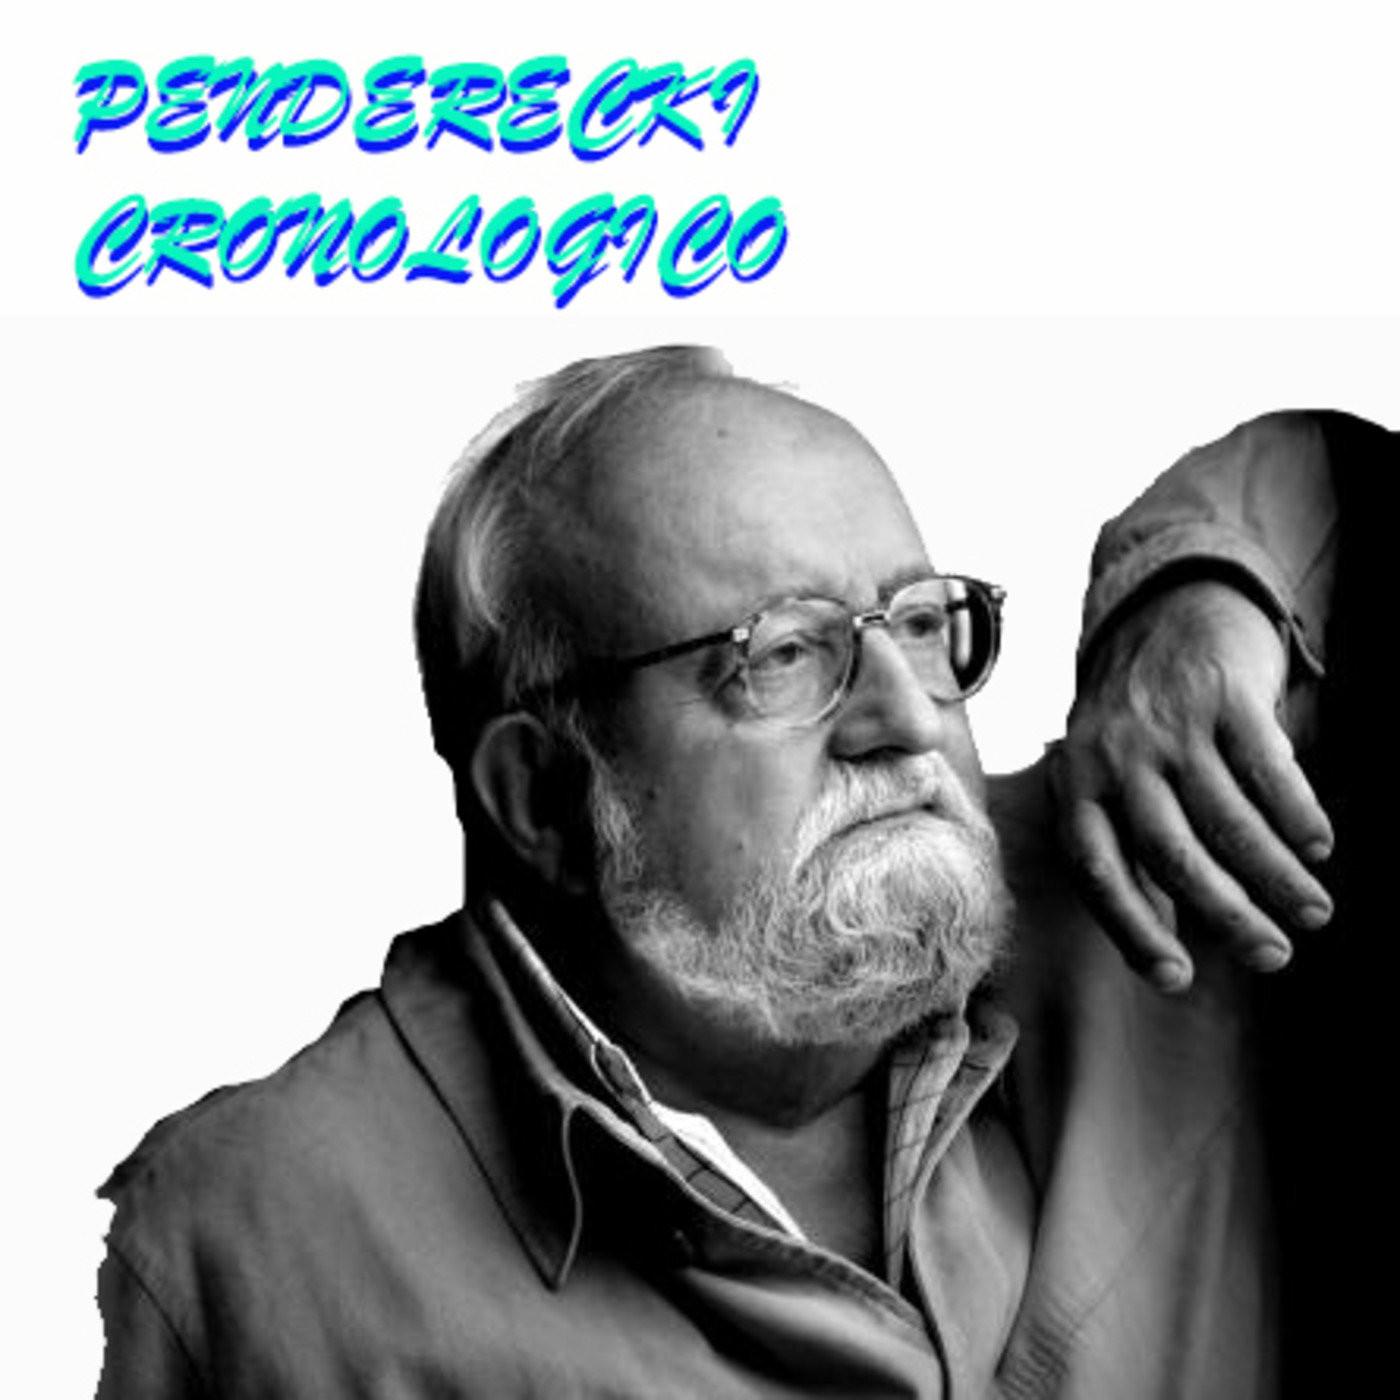 <![CDATA[Penderecki Cronologico]]>